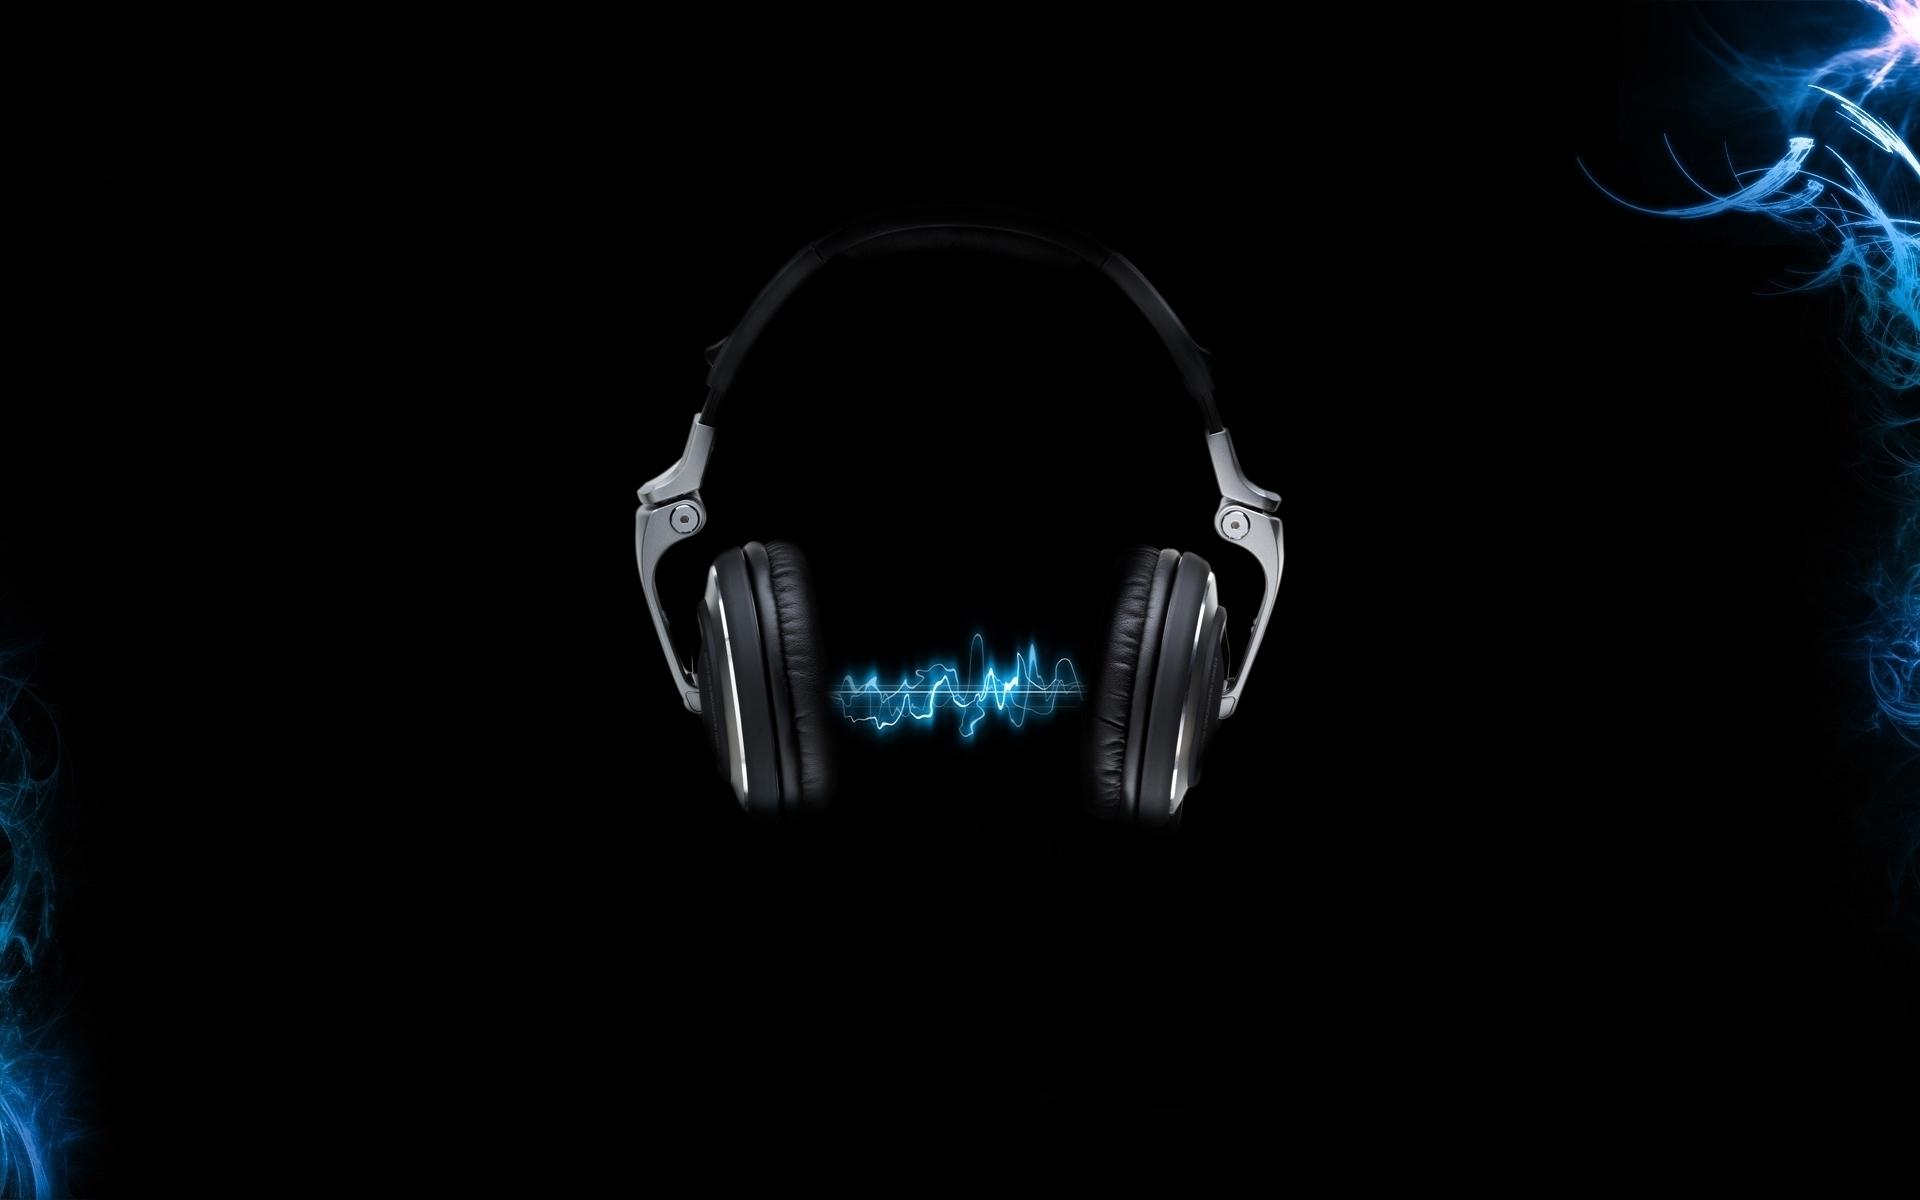 Sound Waves Wallpaper Blue Sound Waves iPhone Wallpaper Blue Sound 1920x1200